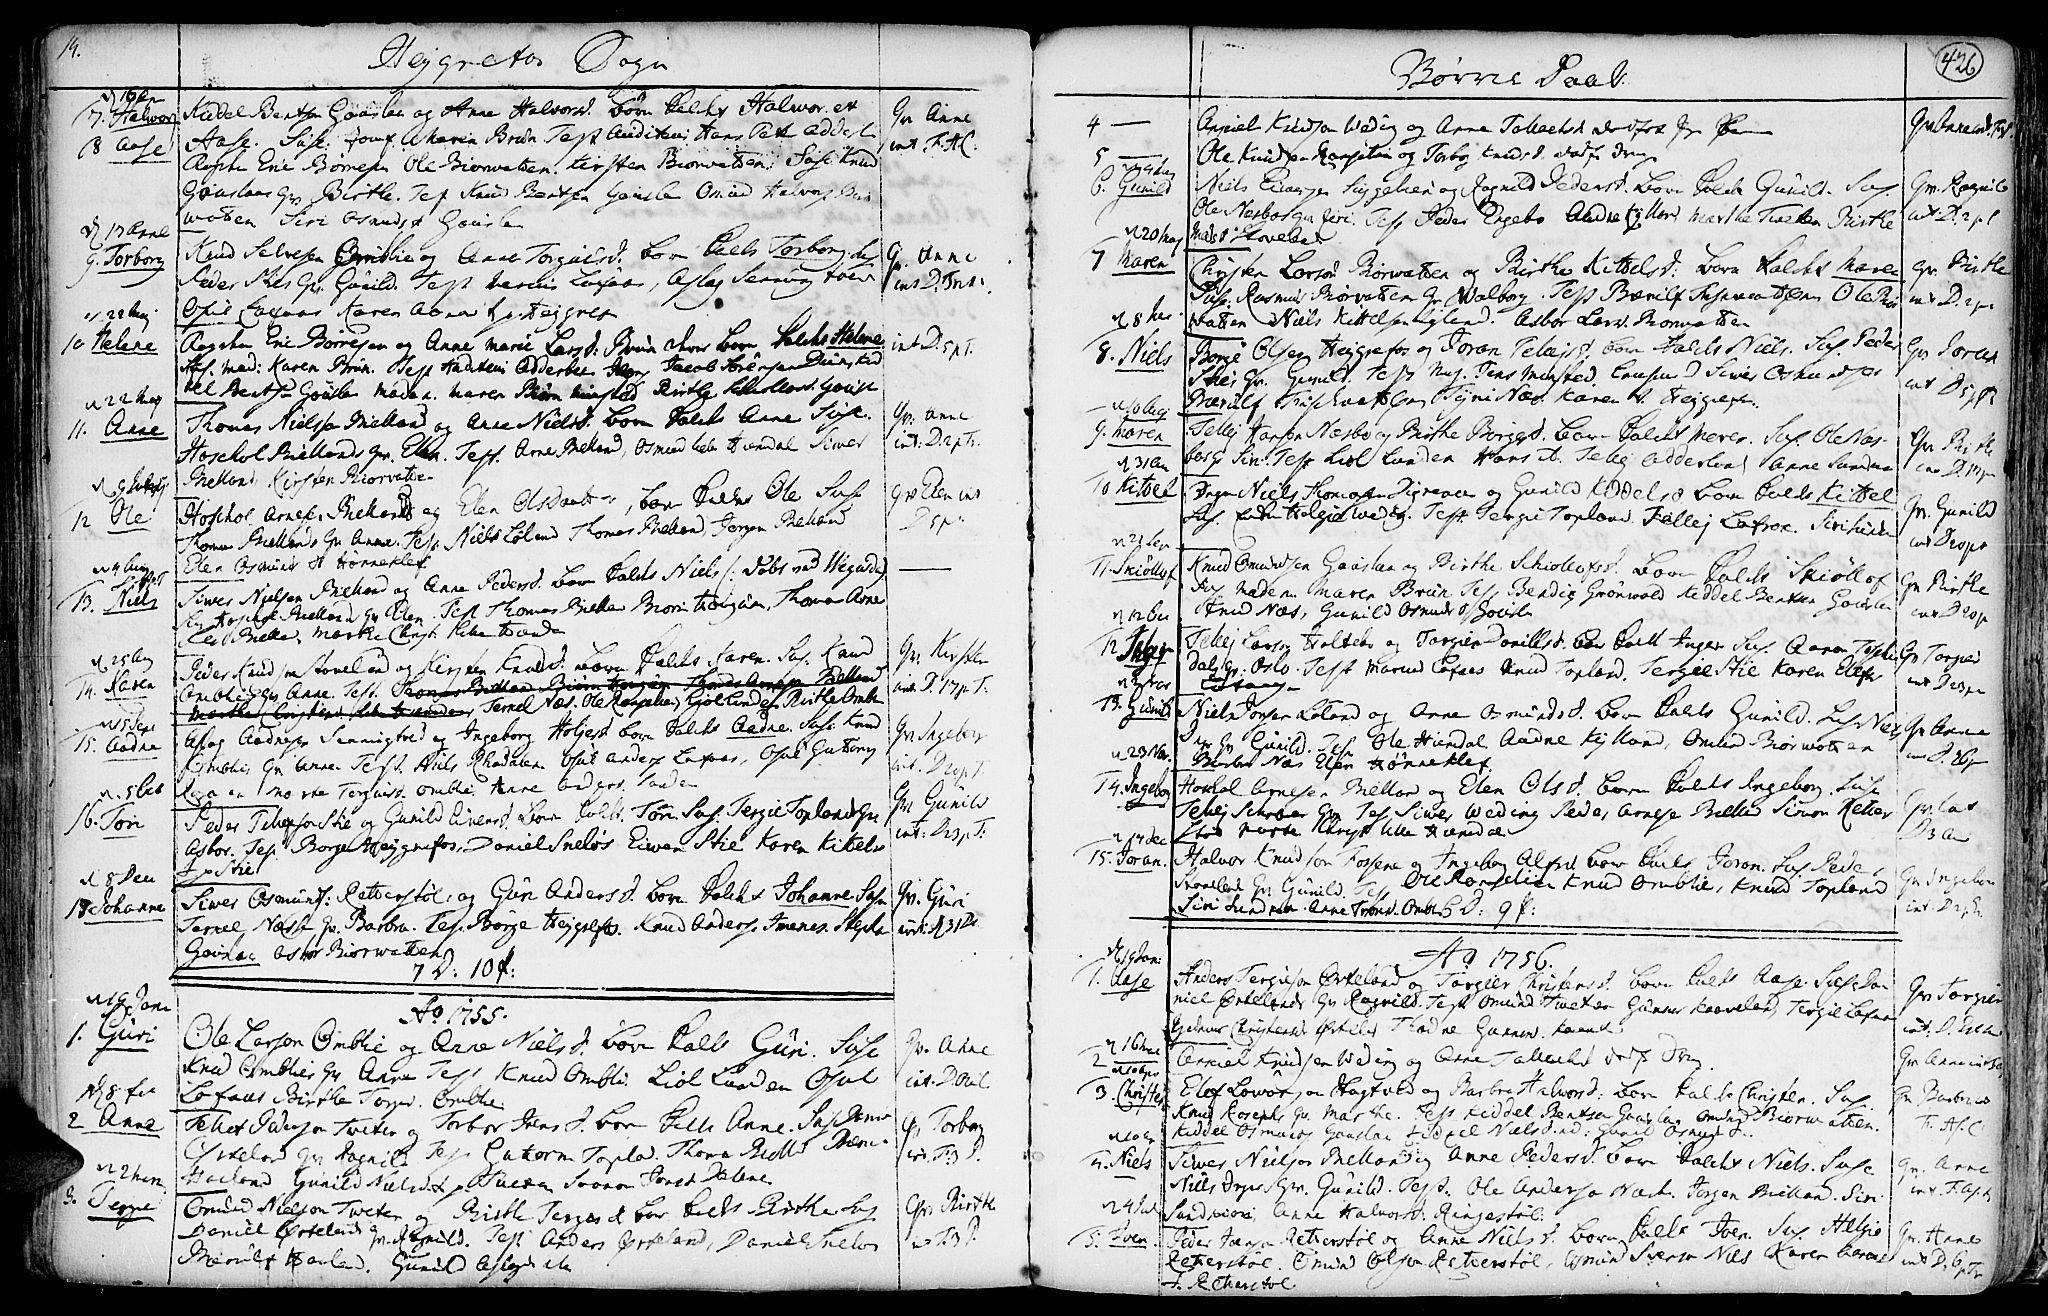 SAK, Hommedal sokneprestkontor, F/Fa/Fab/L0002: Ministerialbok nr. A 2 /3, 1740-1821, s. 426